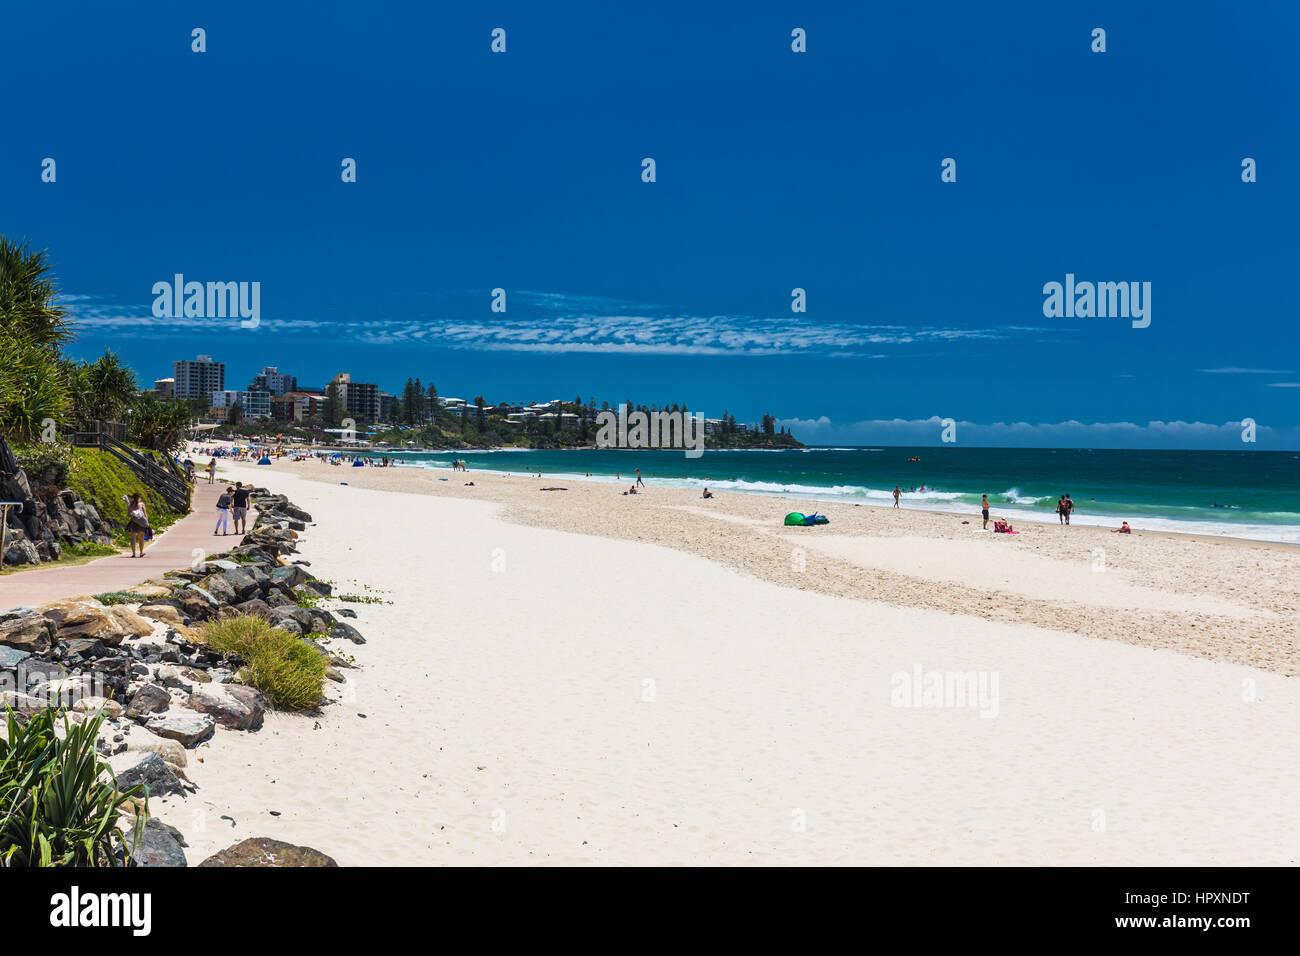 Sunshine Coast Queensland Stock Photos & Sunshine Coast Queensland ...